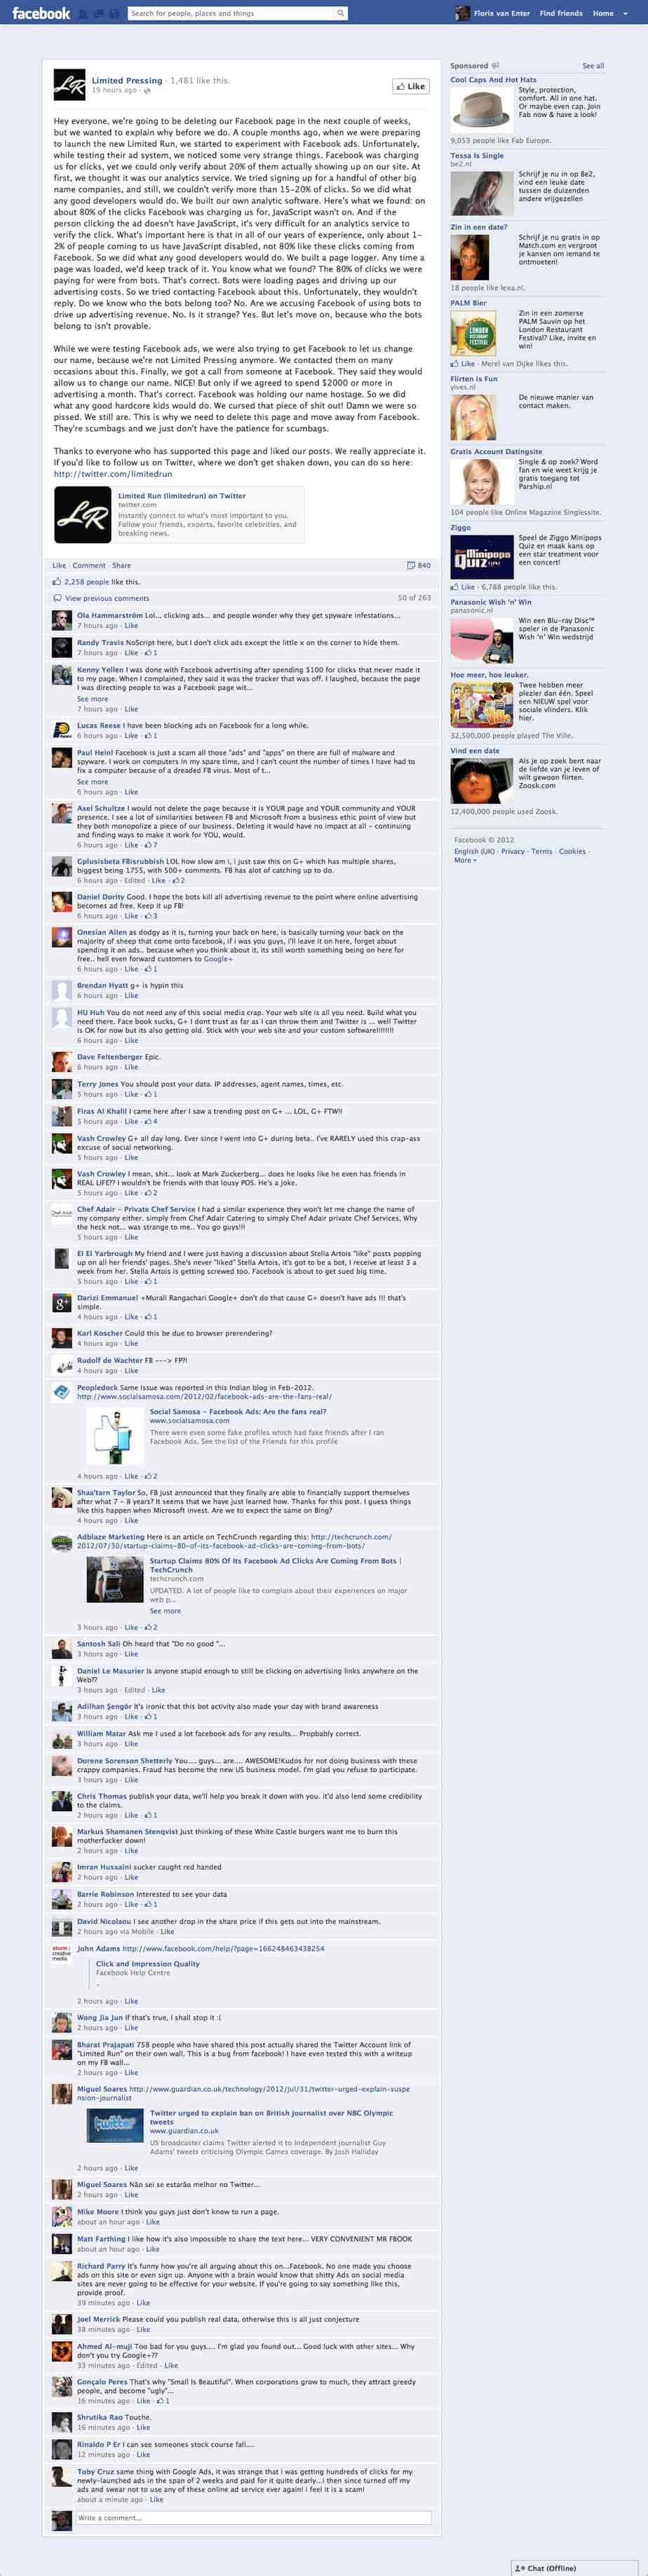 Company Facebook Ads complain